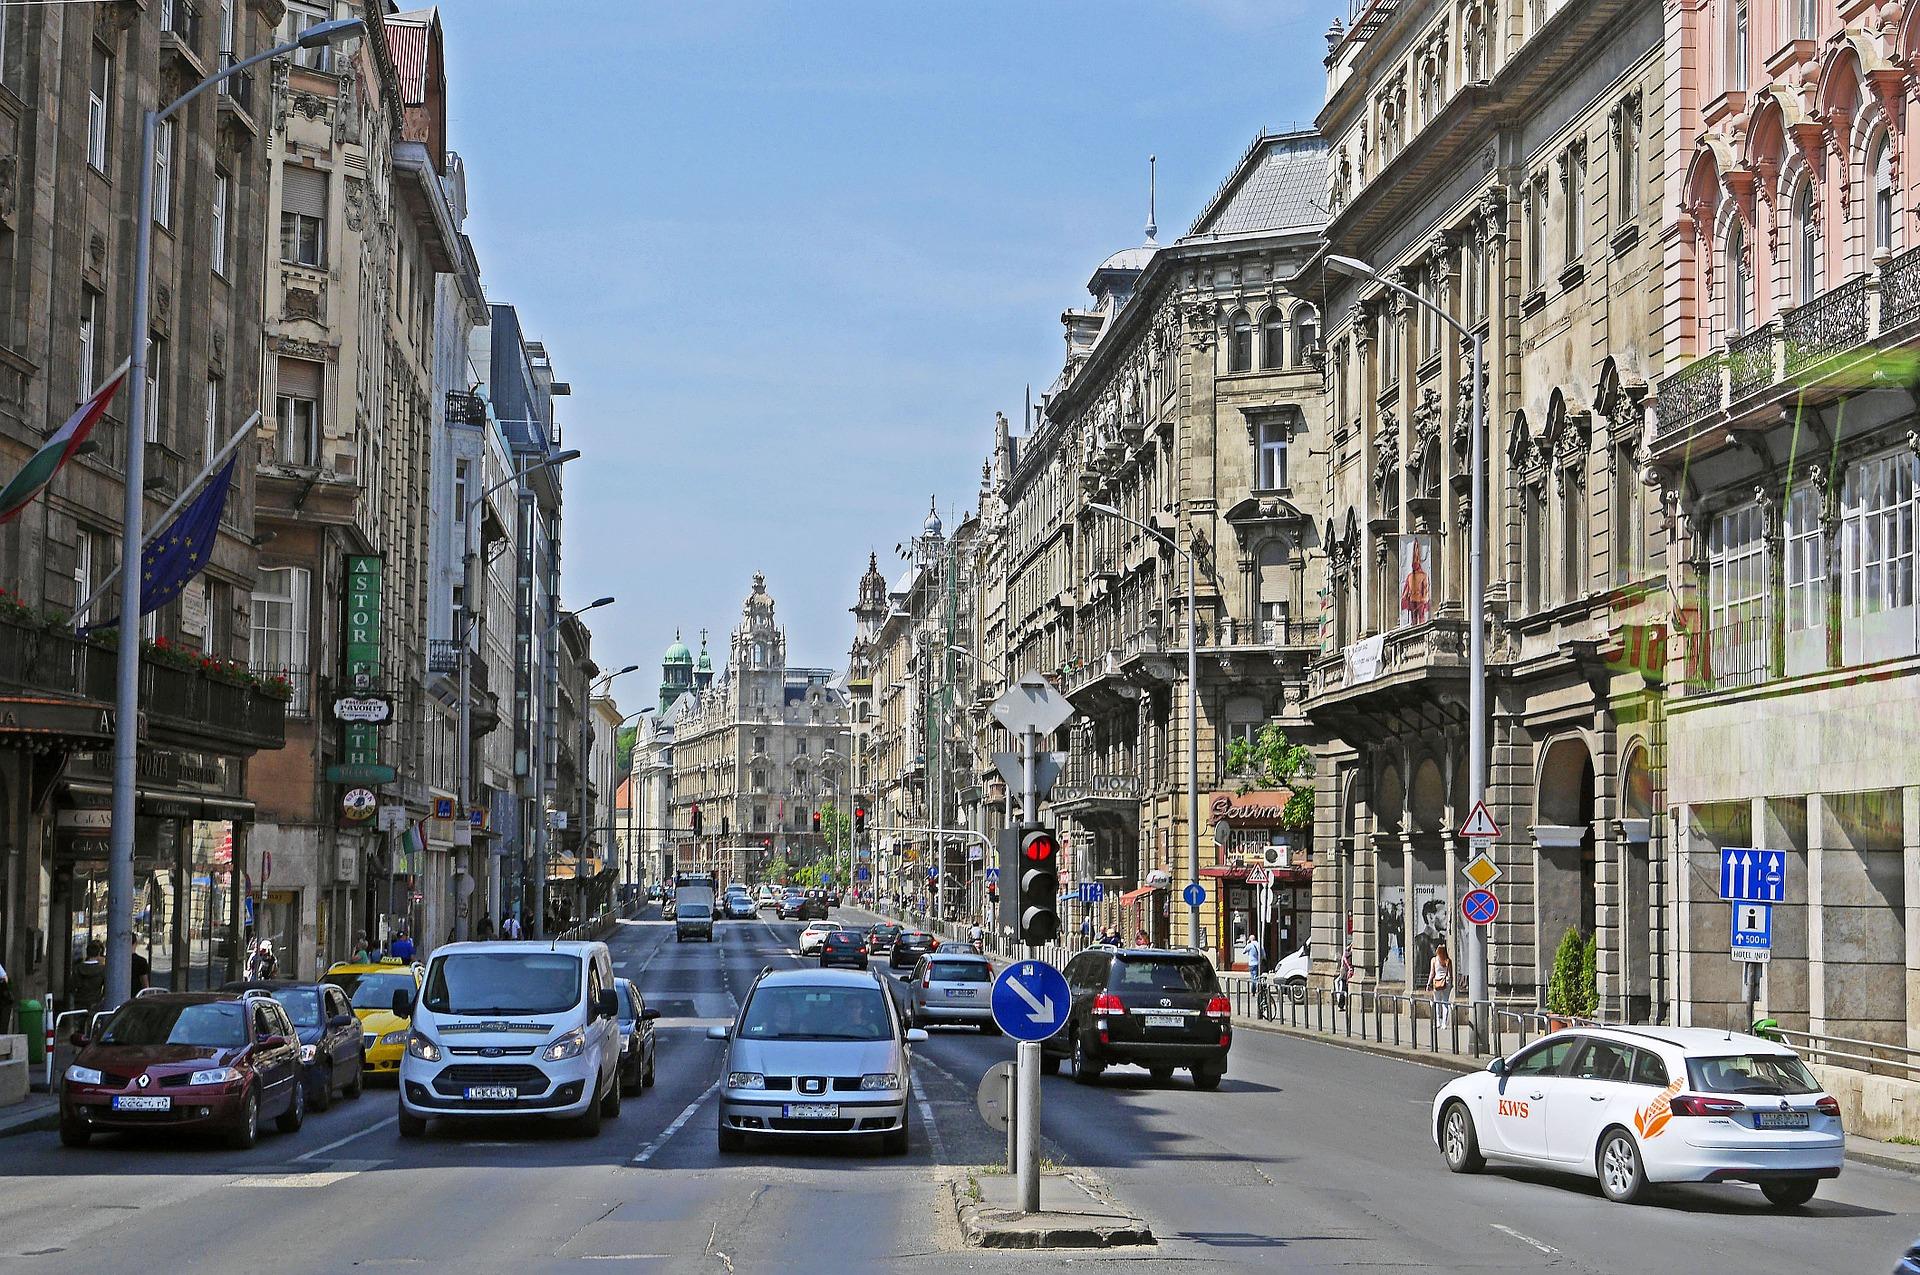 budapest-1349290_1920.jpg